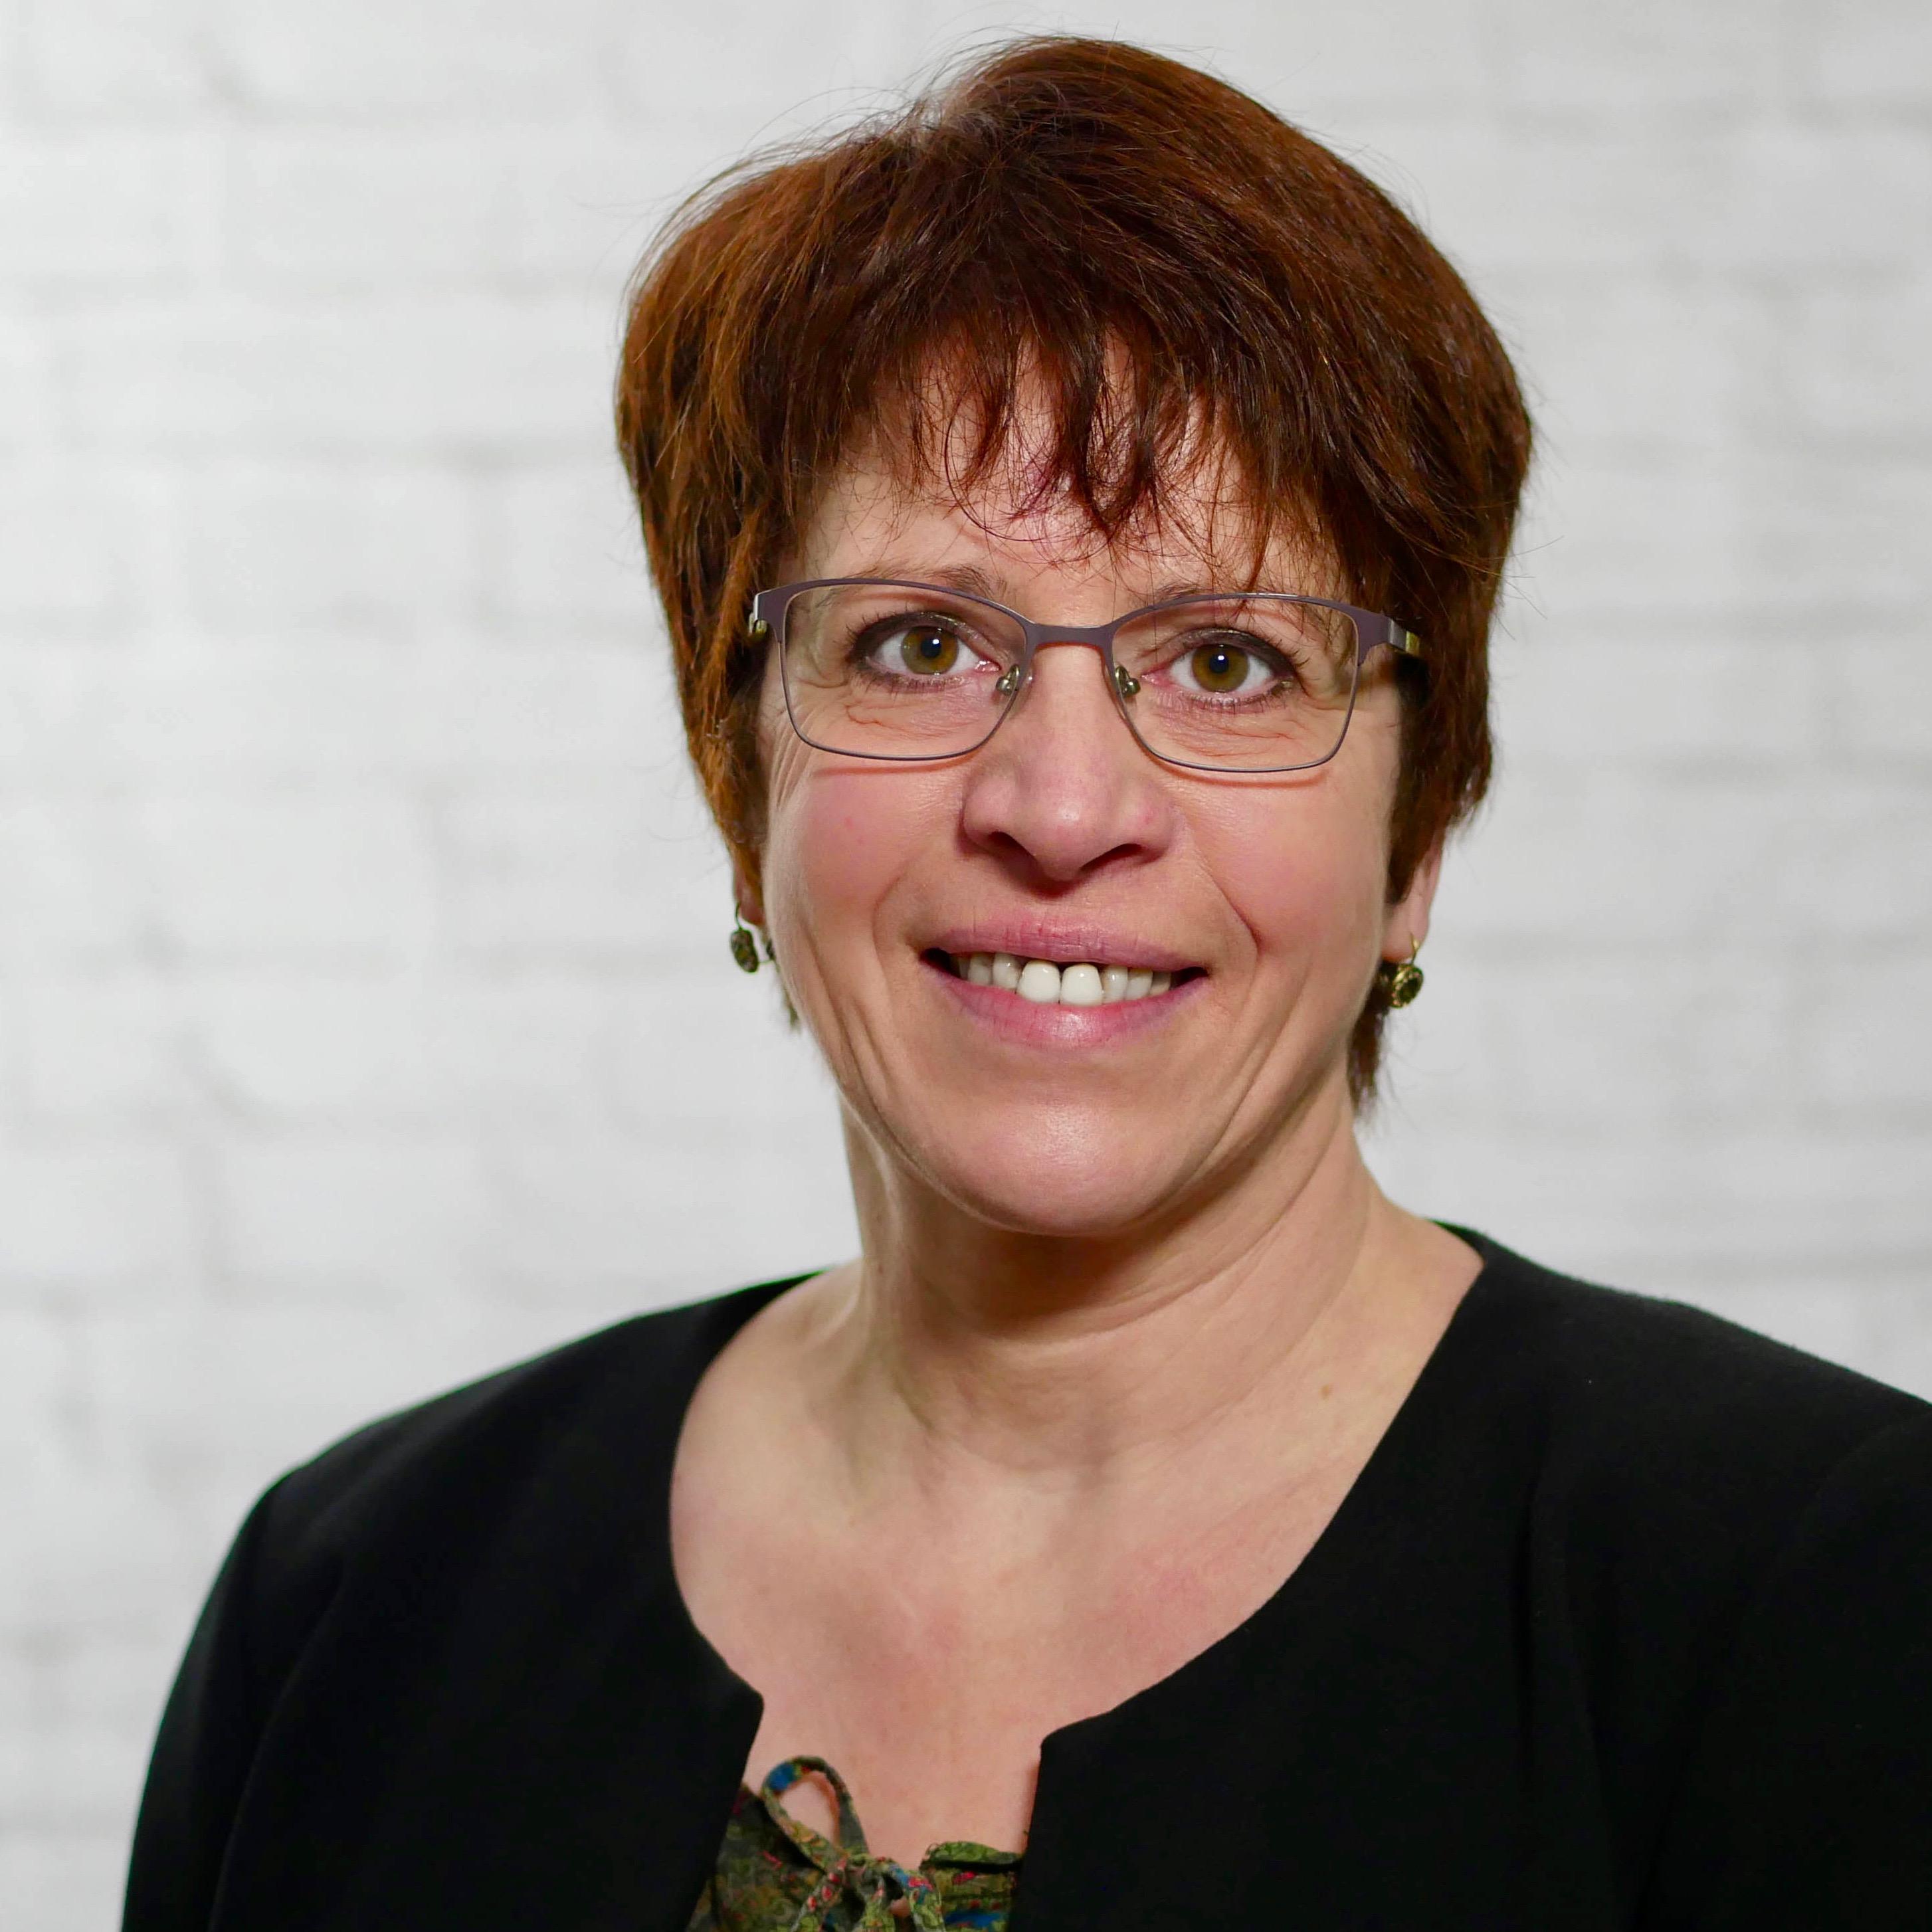 Monika Thömmes